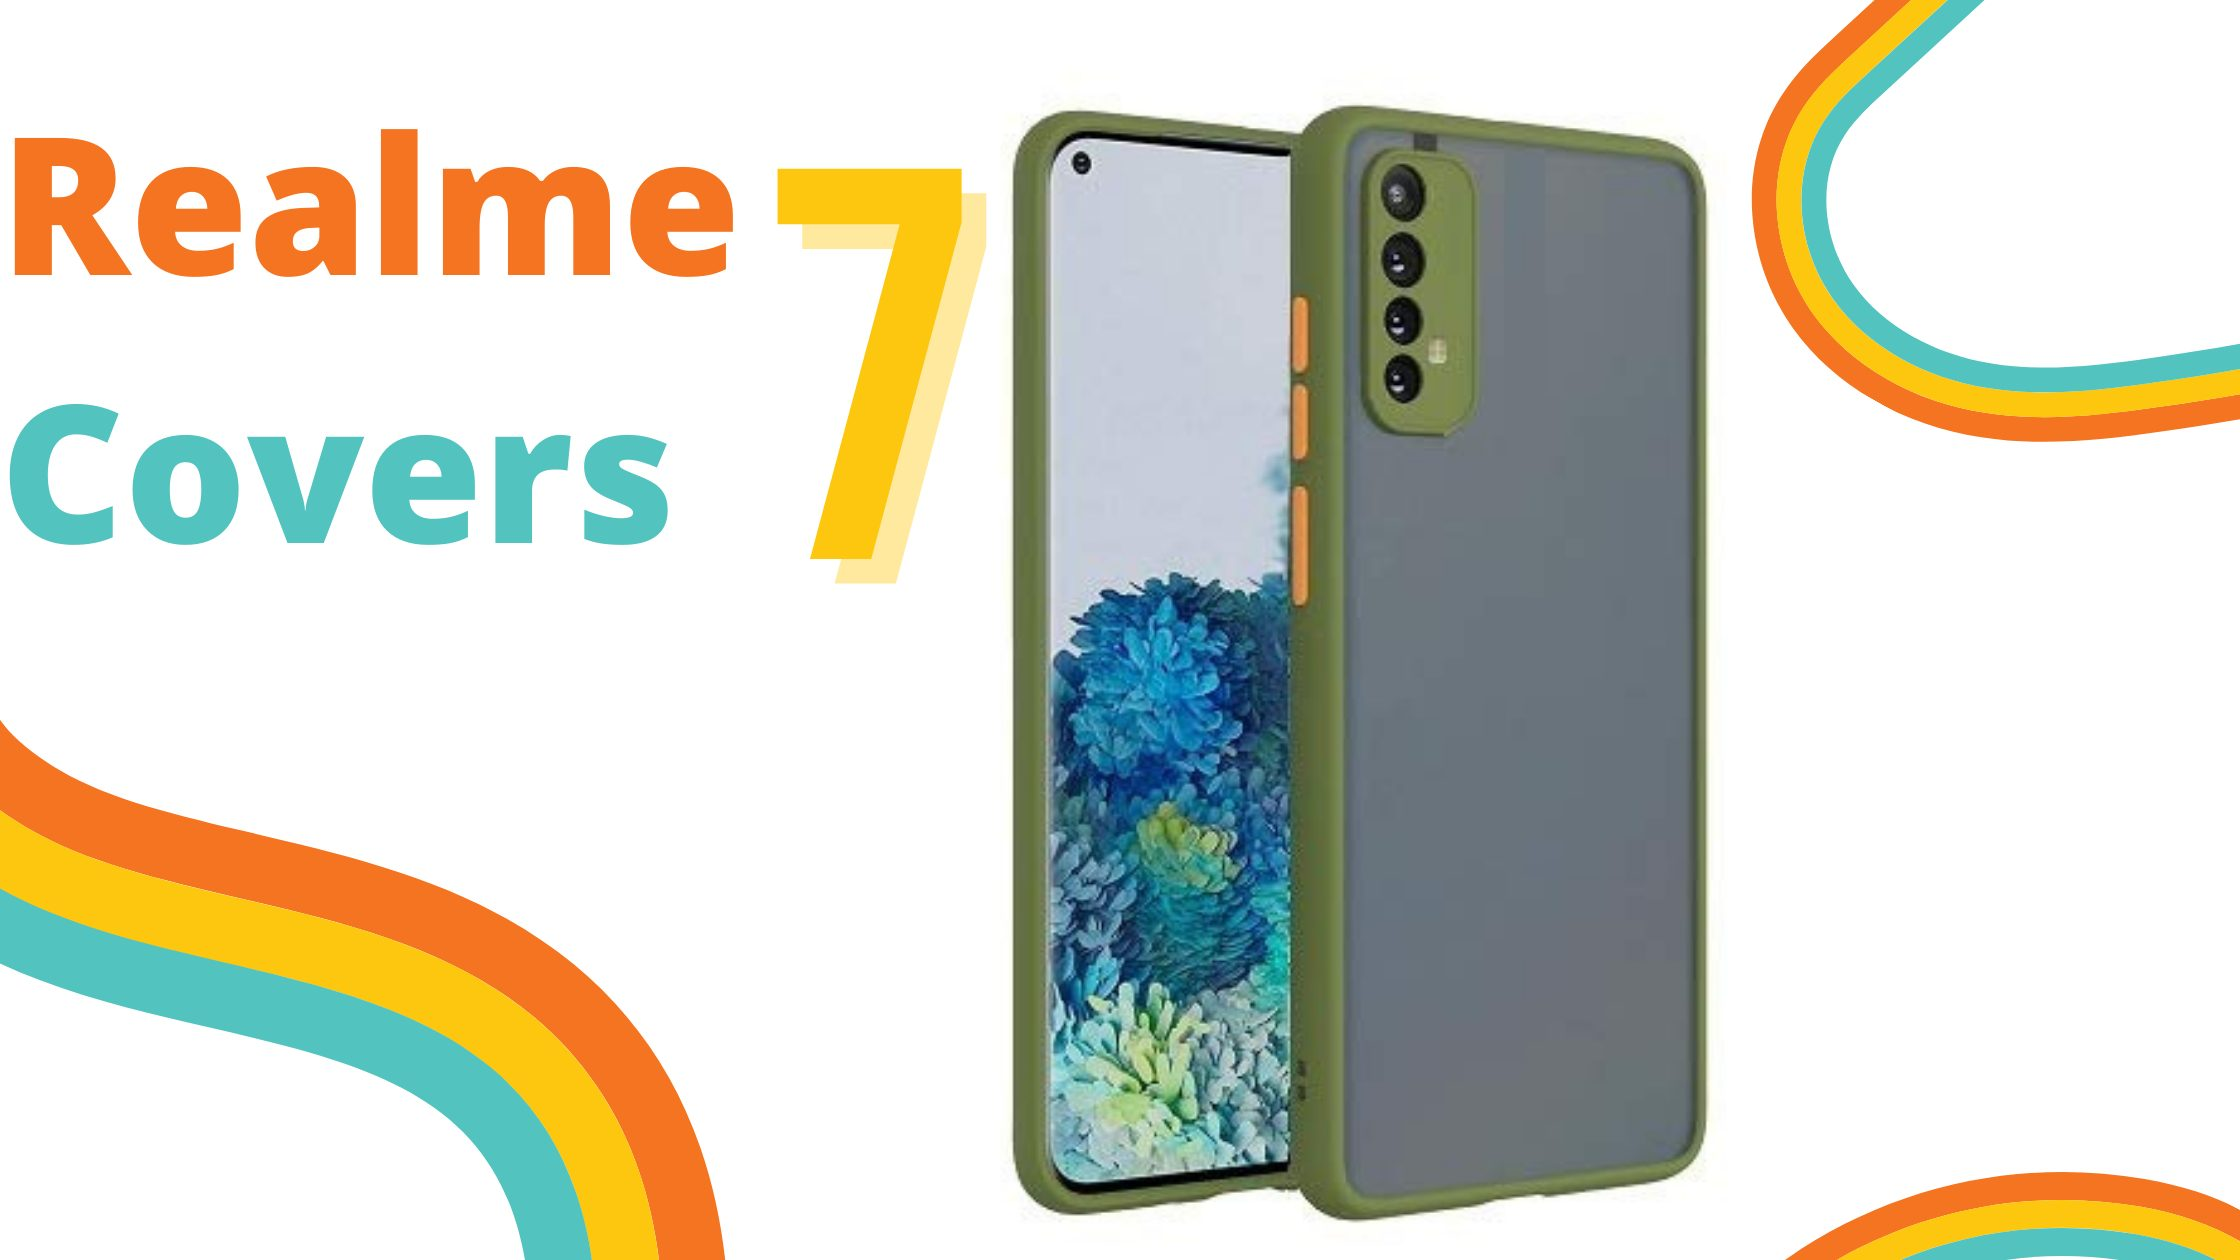 Realme 7 Covers